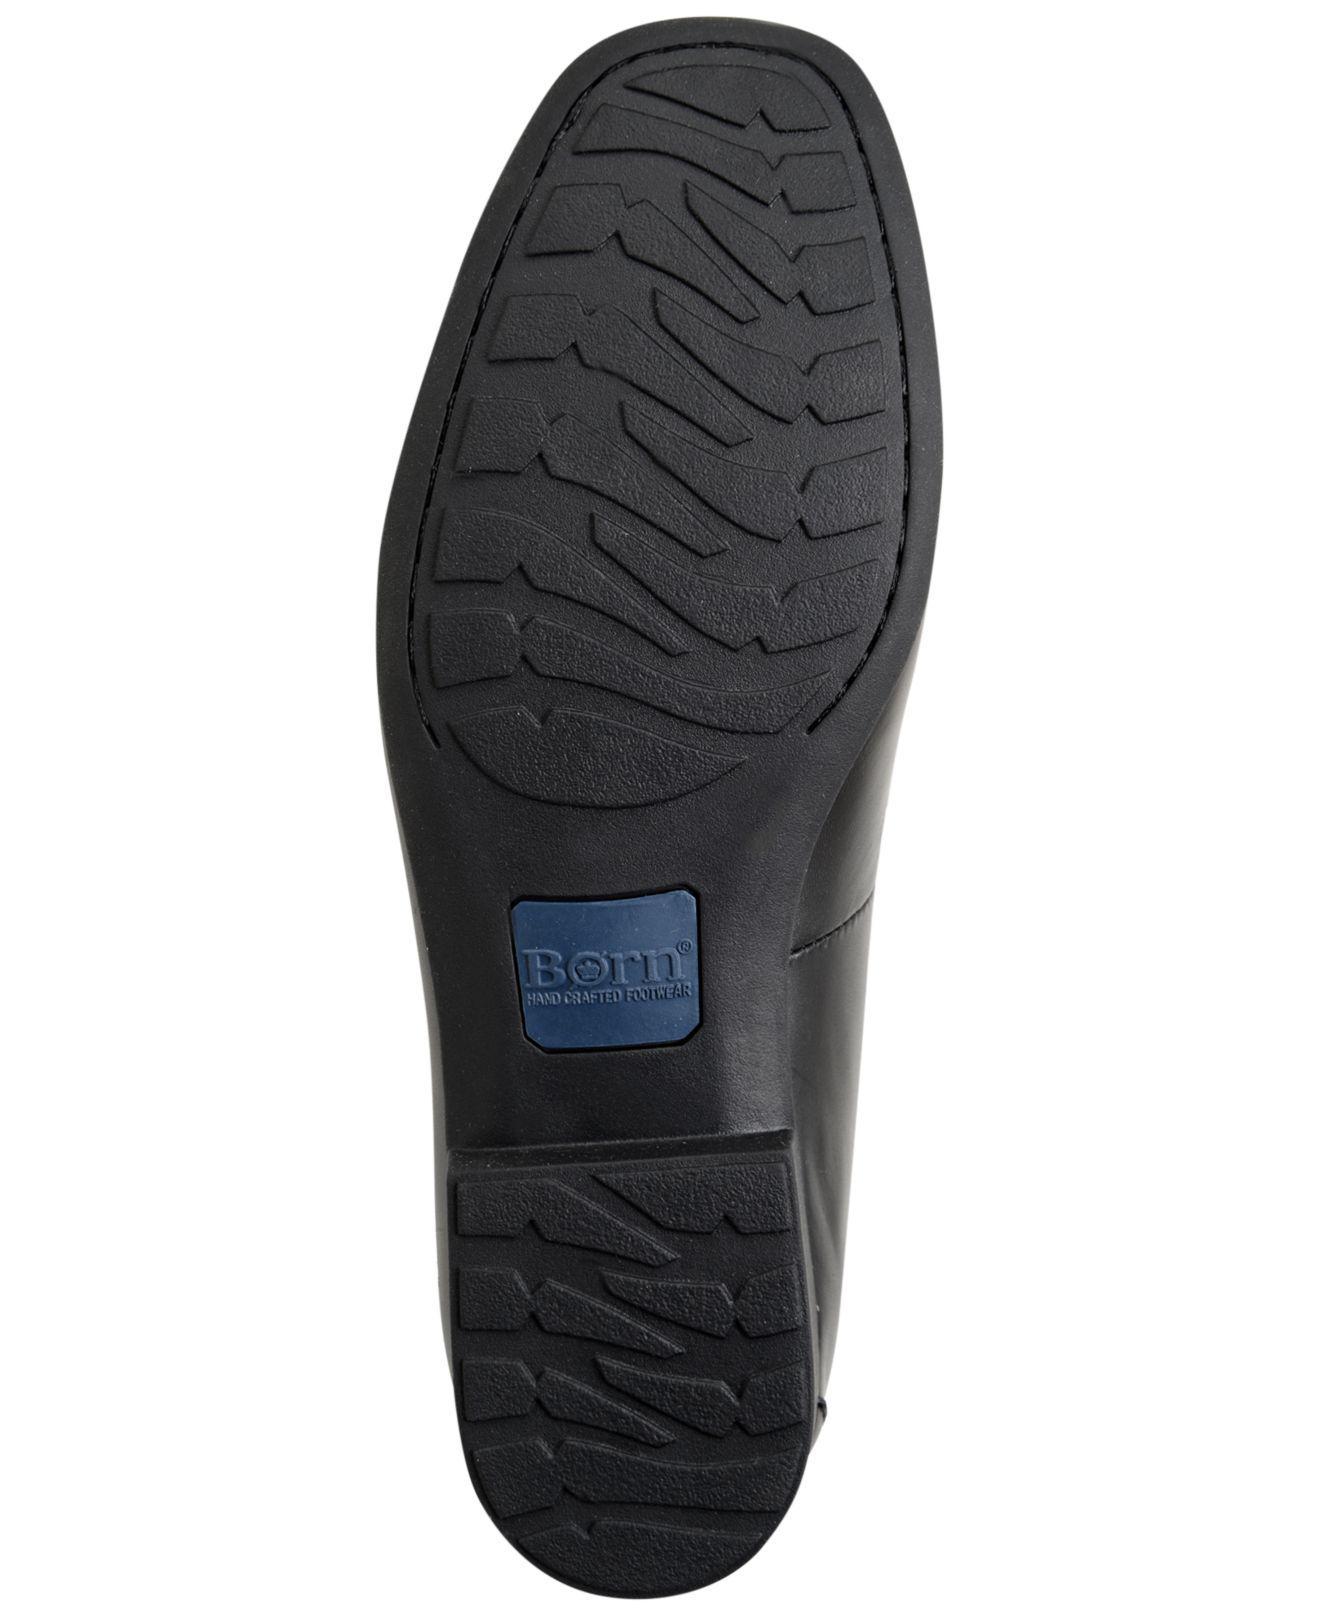 b2612446e4e Born - Black Men s Dave Penny Moc-toe Slip-on Loafers for Men -. View  fullscreen